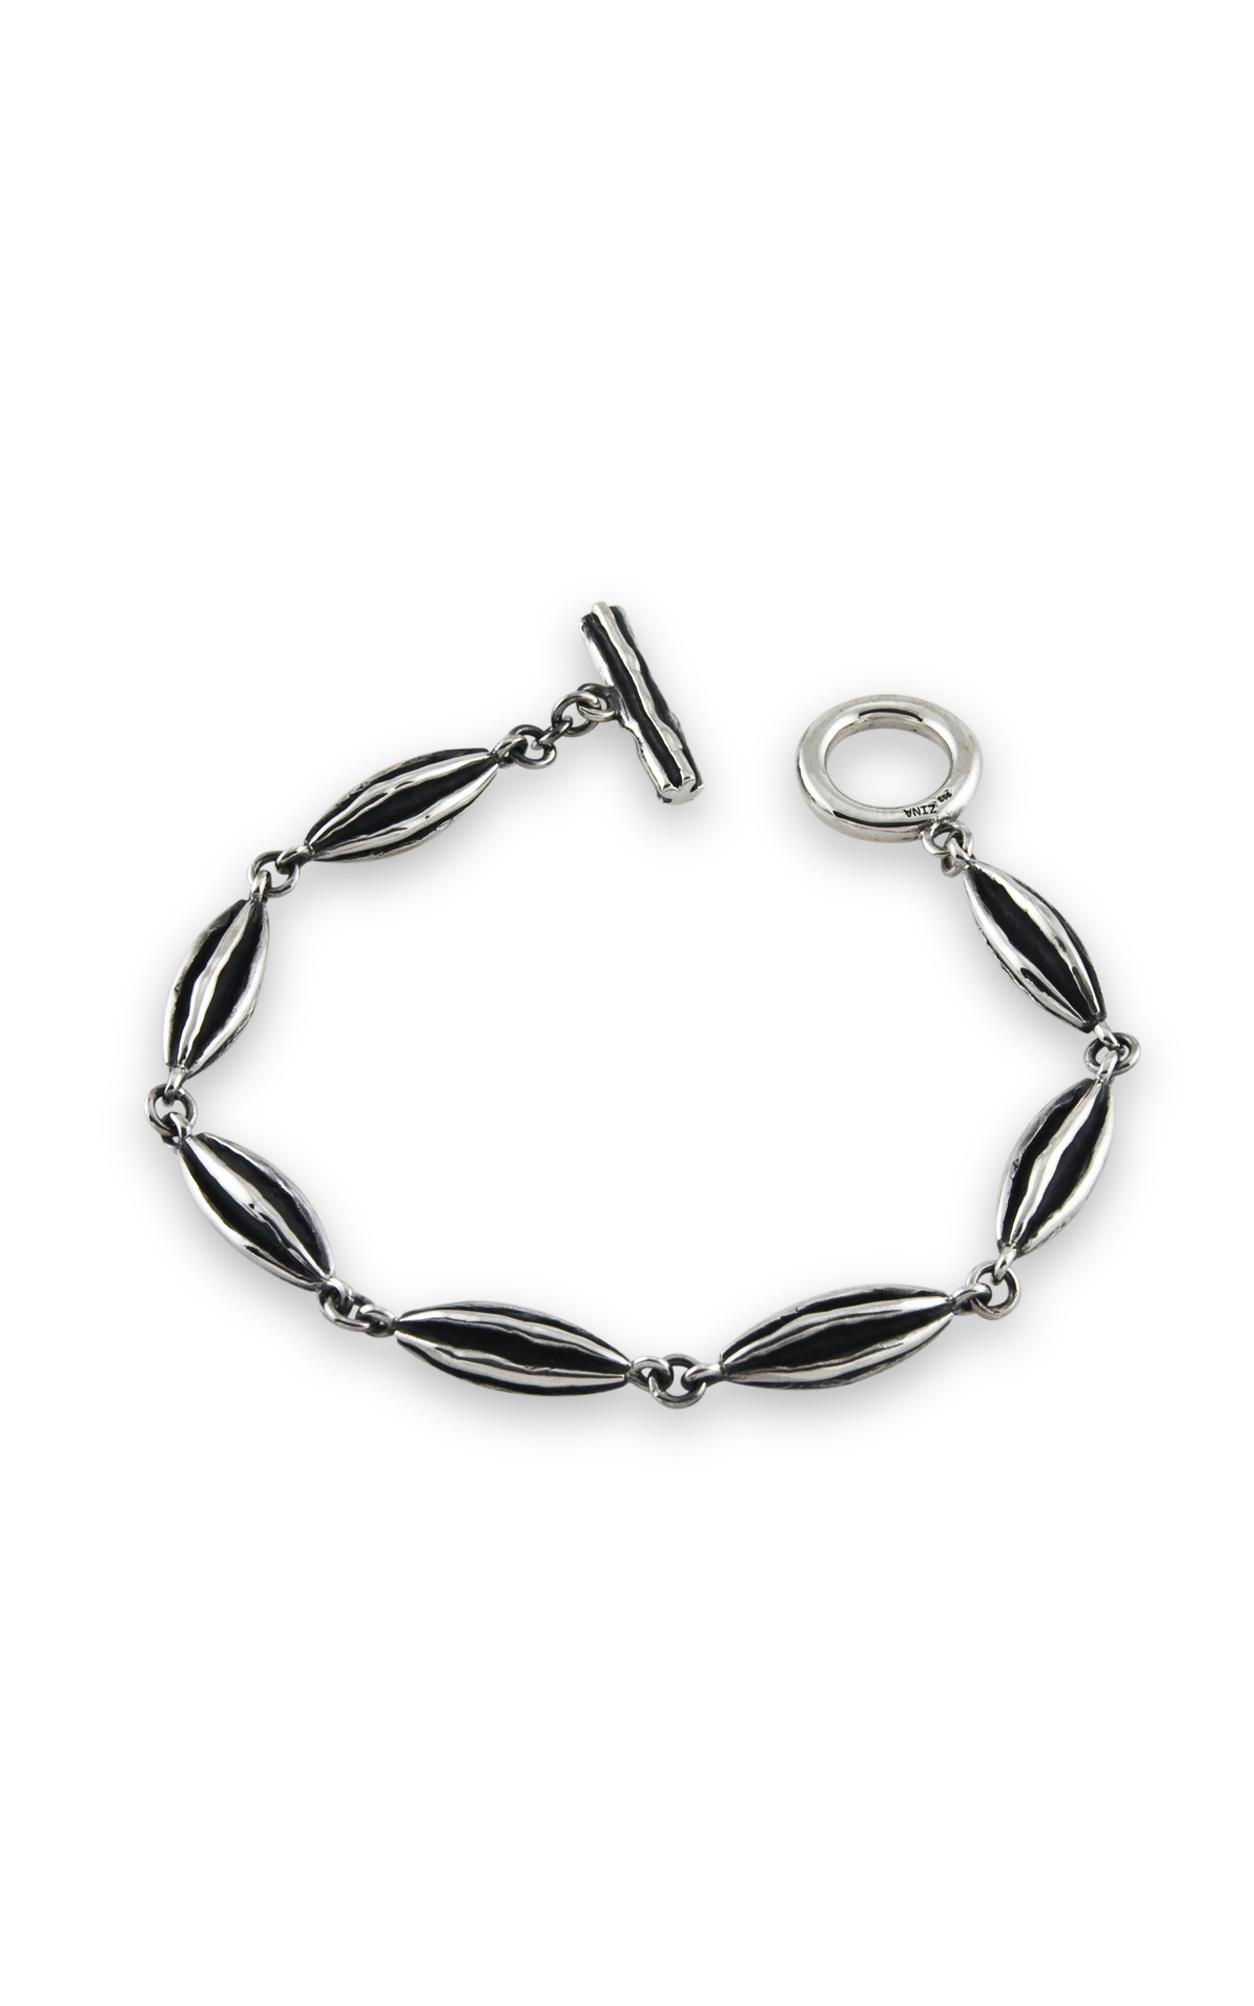 Zina Waves and Meditation Bracelet A1303-7 product image